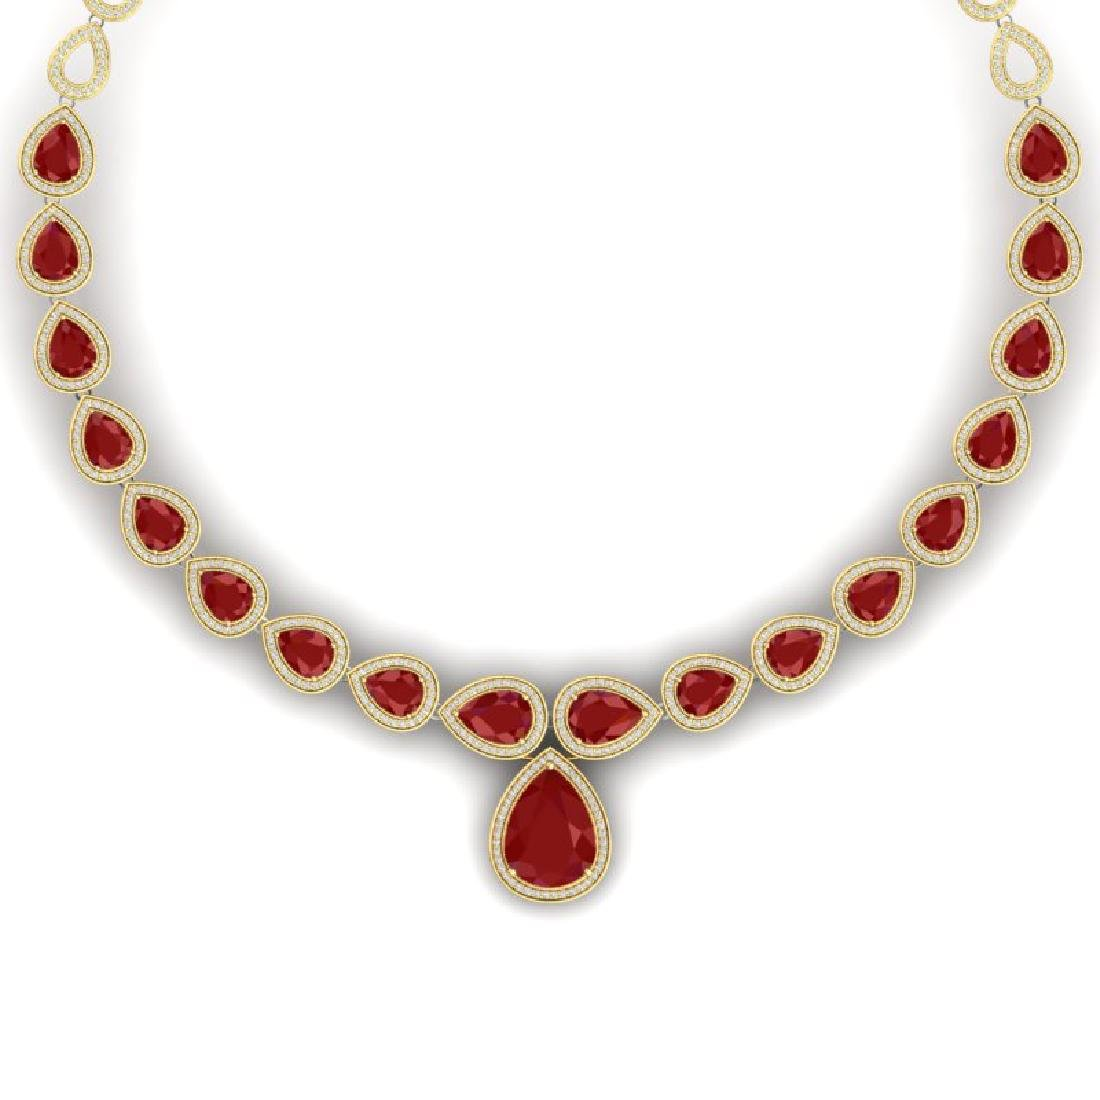 51.41 CTW Royalty Ruby & VS Diamond Necklace 18K Yellow